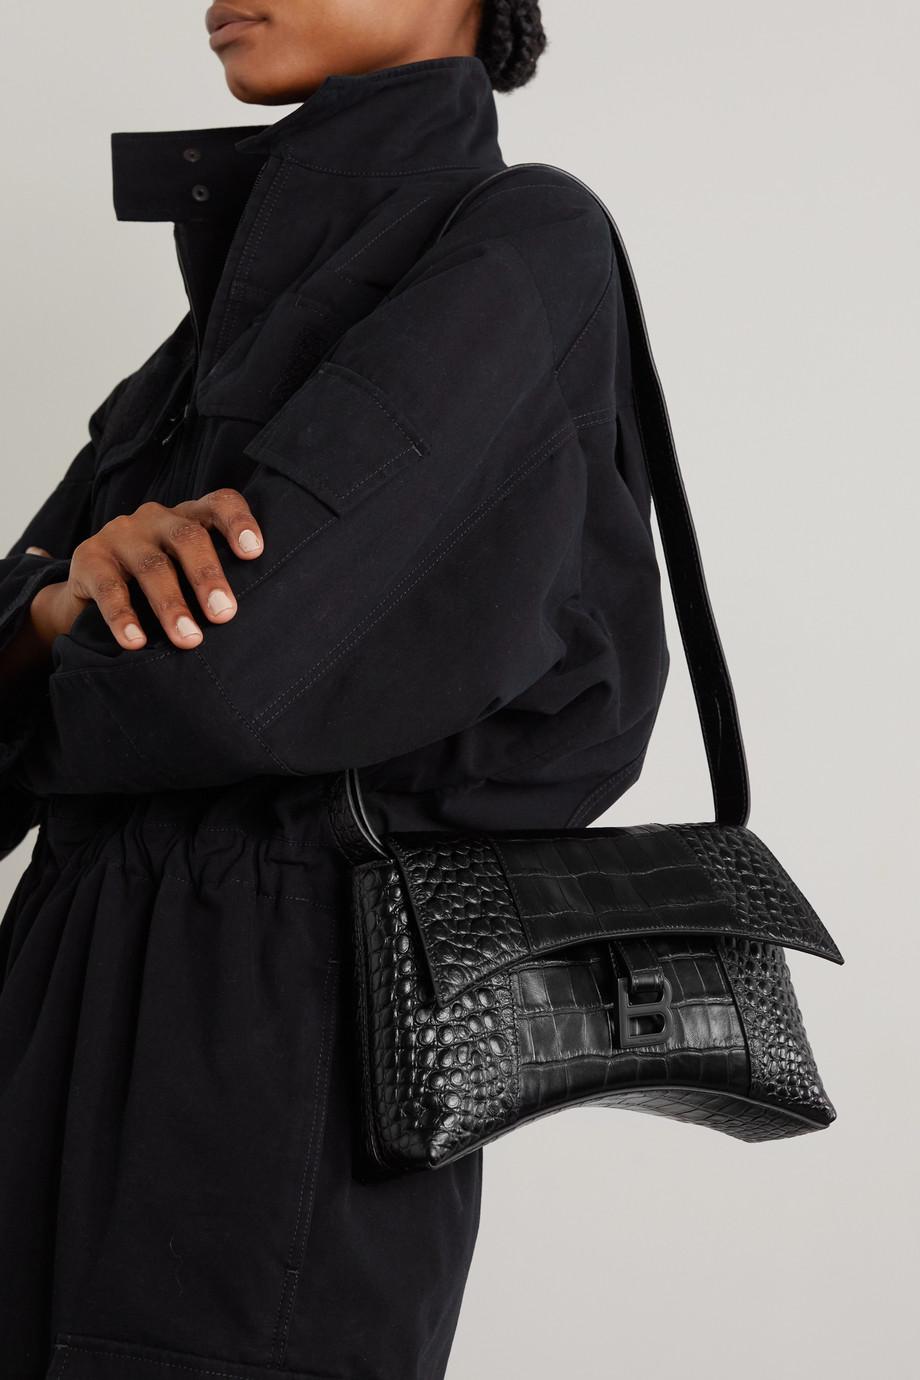 Balenciaga Hourglass XS croc-effect leather shoulder bag